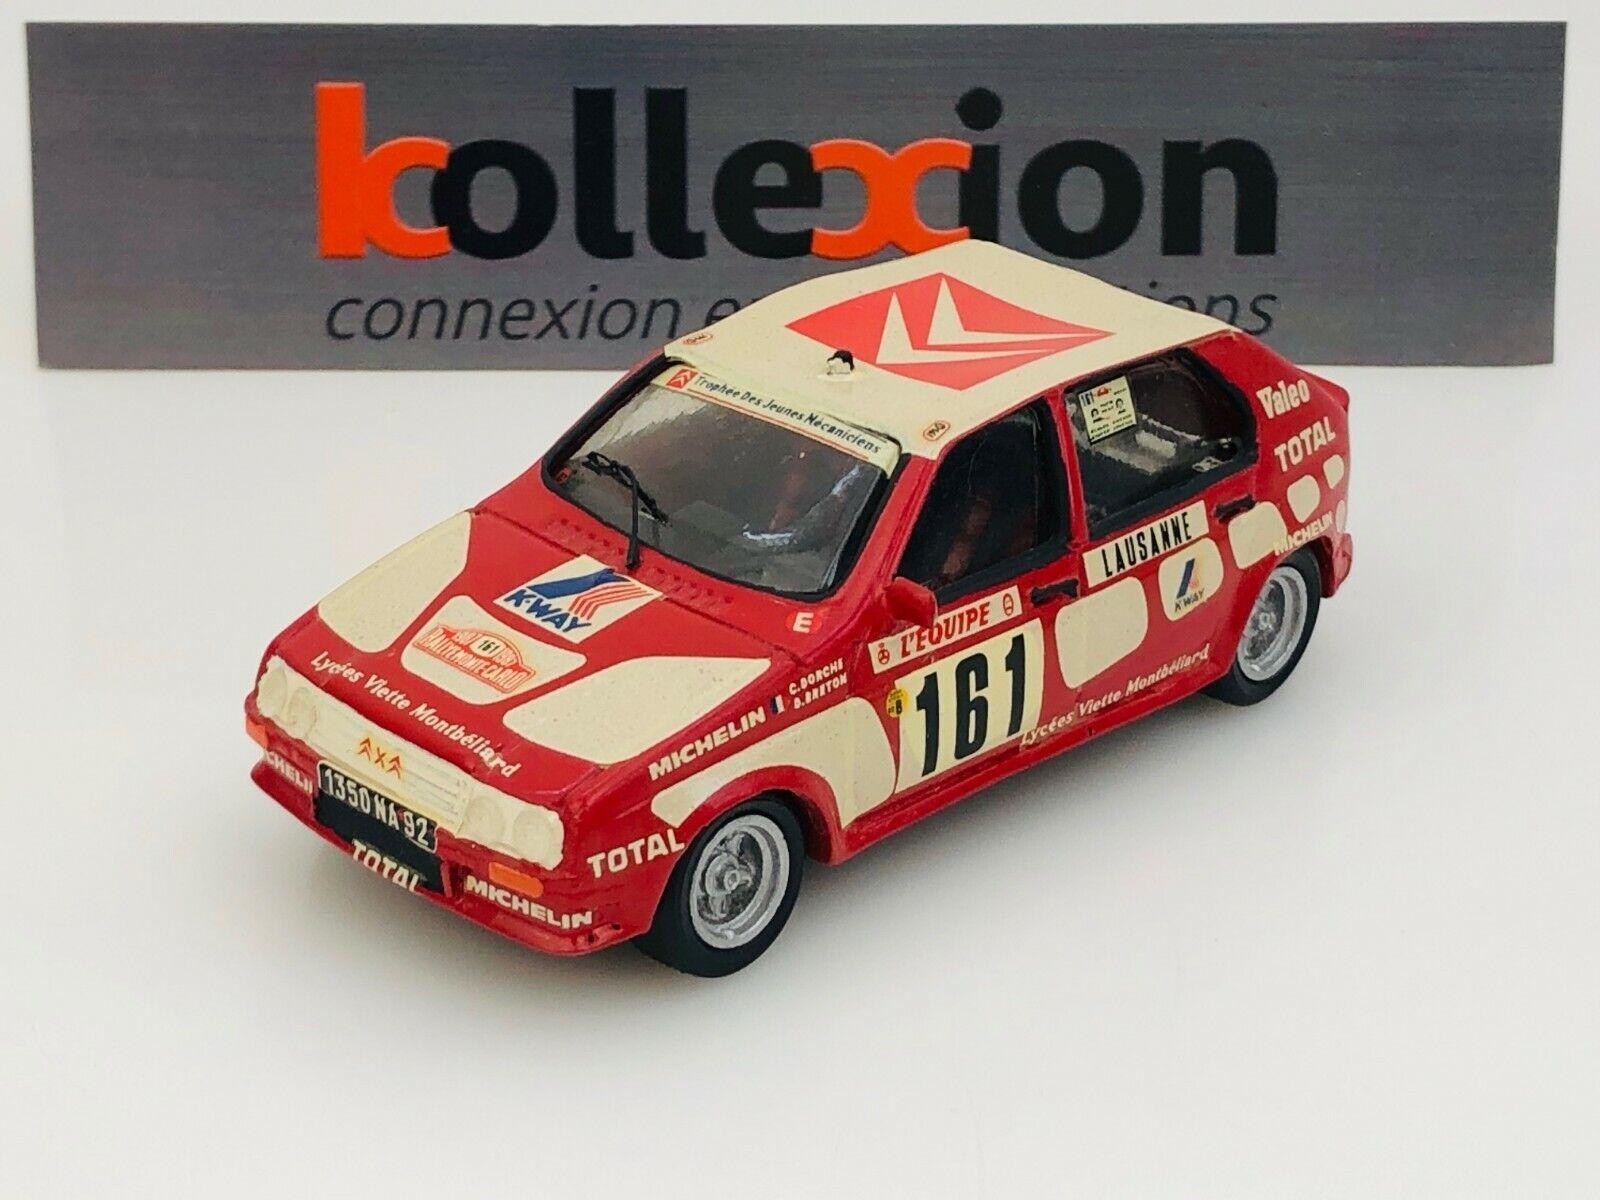 Dm modeles citroen visa 1000 pistes nº 161 rally montecarlo 1987 C. dorche 1.43